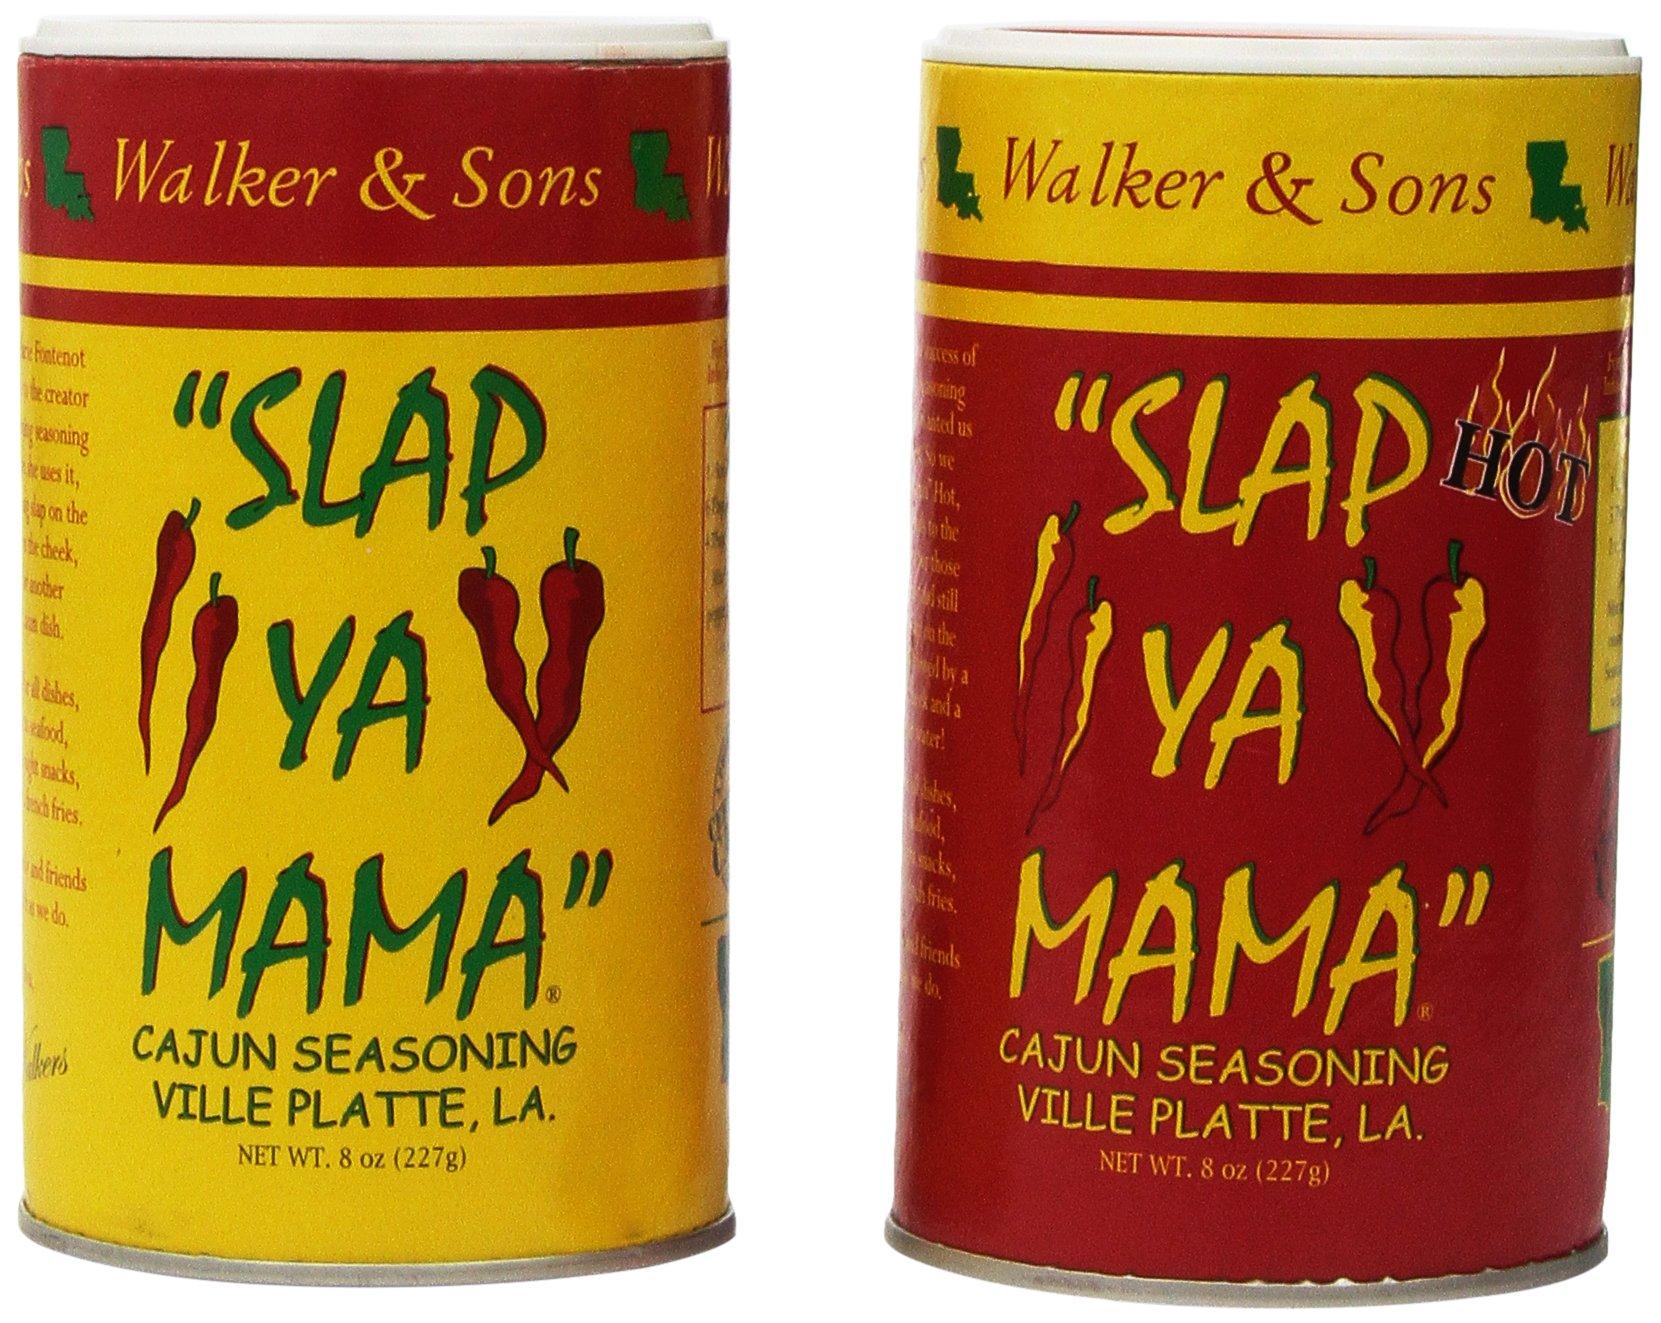 Slap Ya Mama All Natural Cajun Seasoning from L